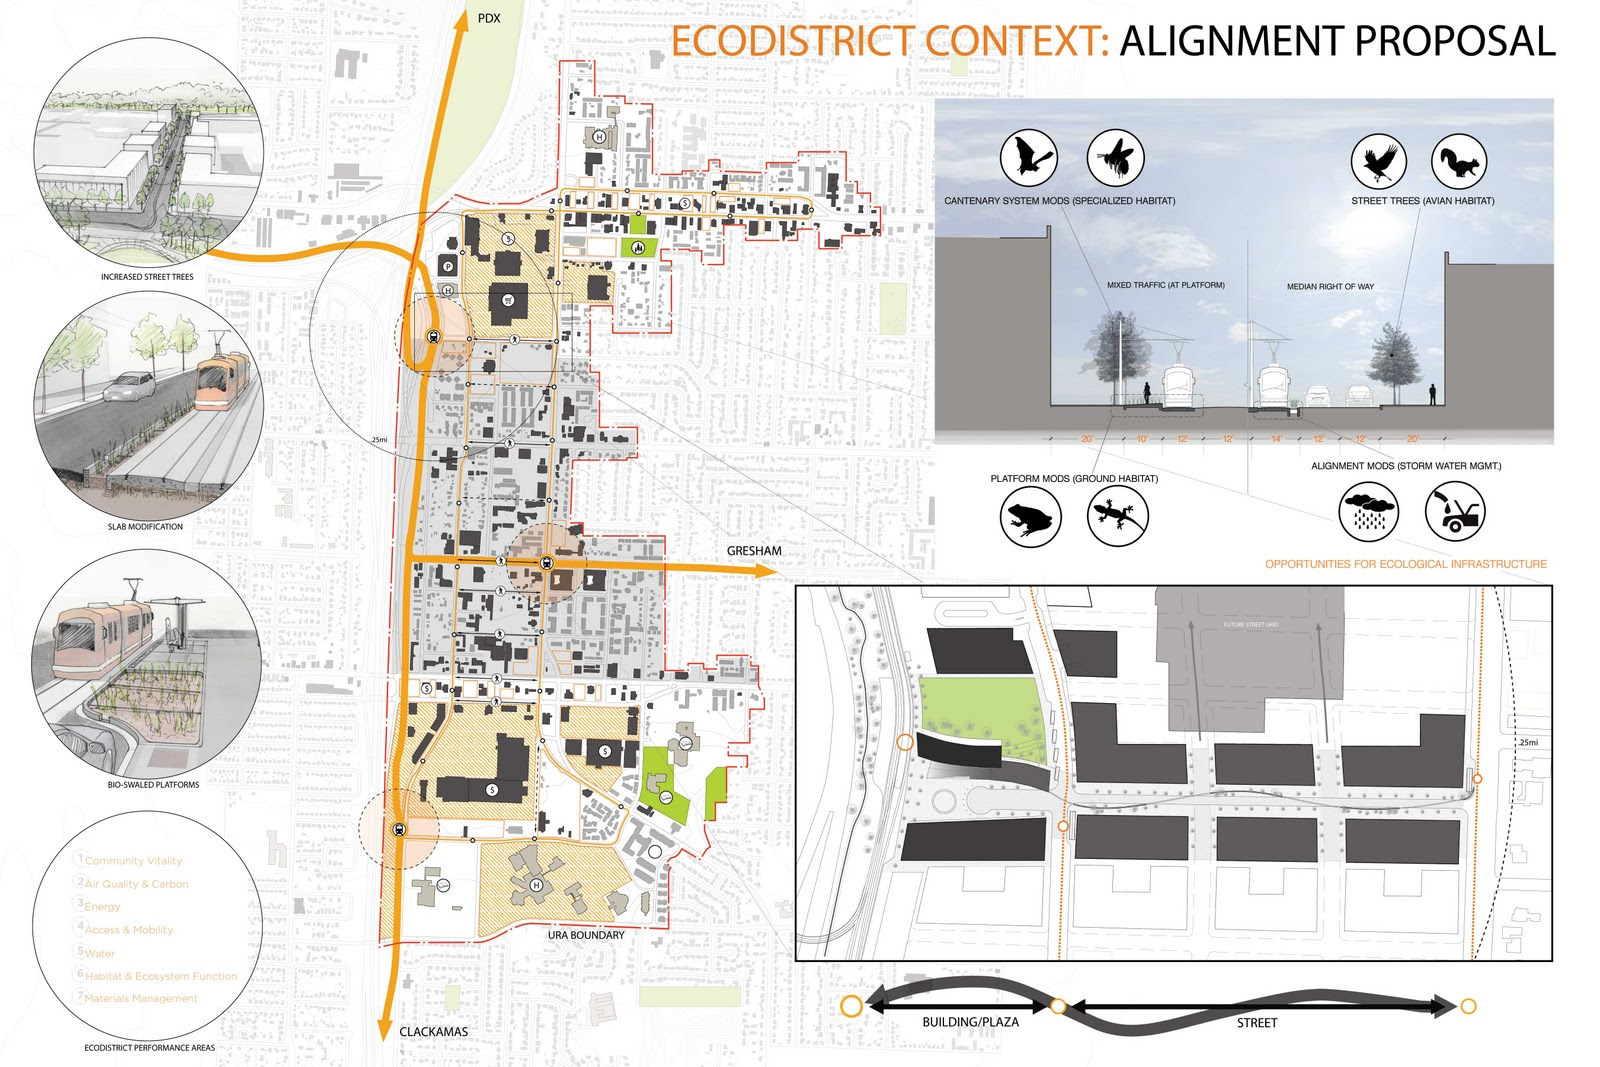 Urban Design Character Analysis : Images about analysis grapics on pinterest urban